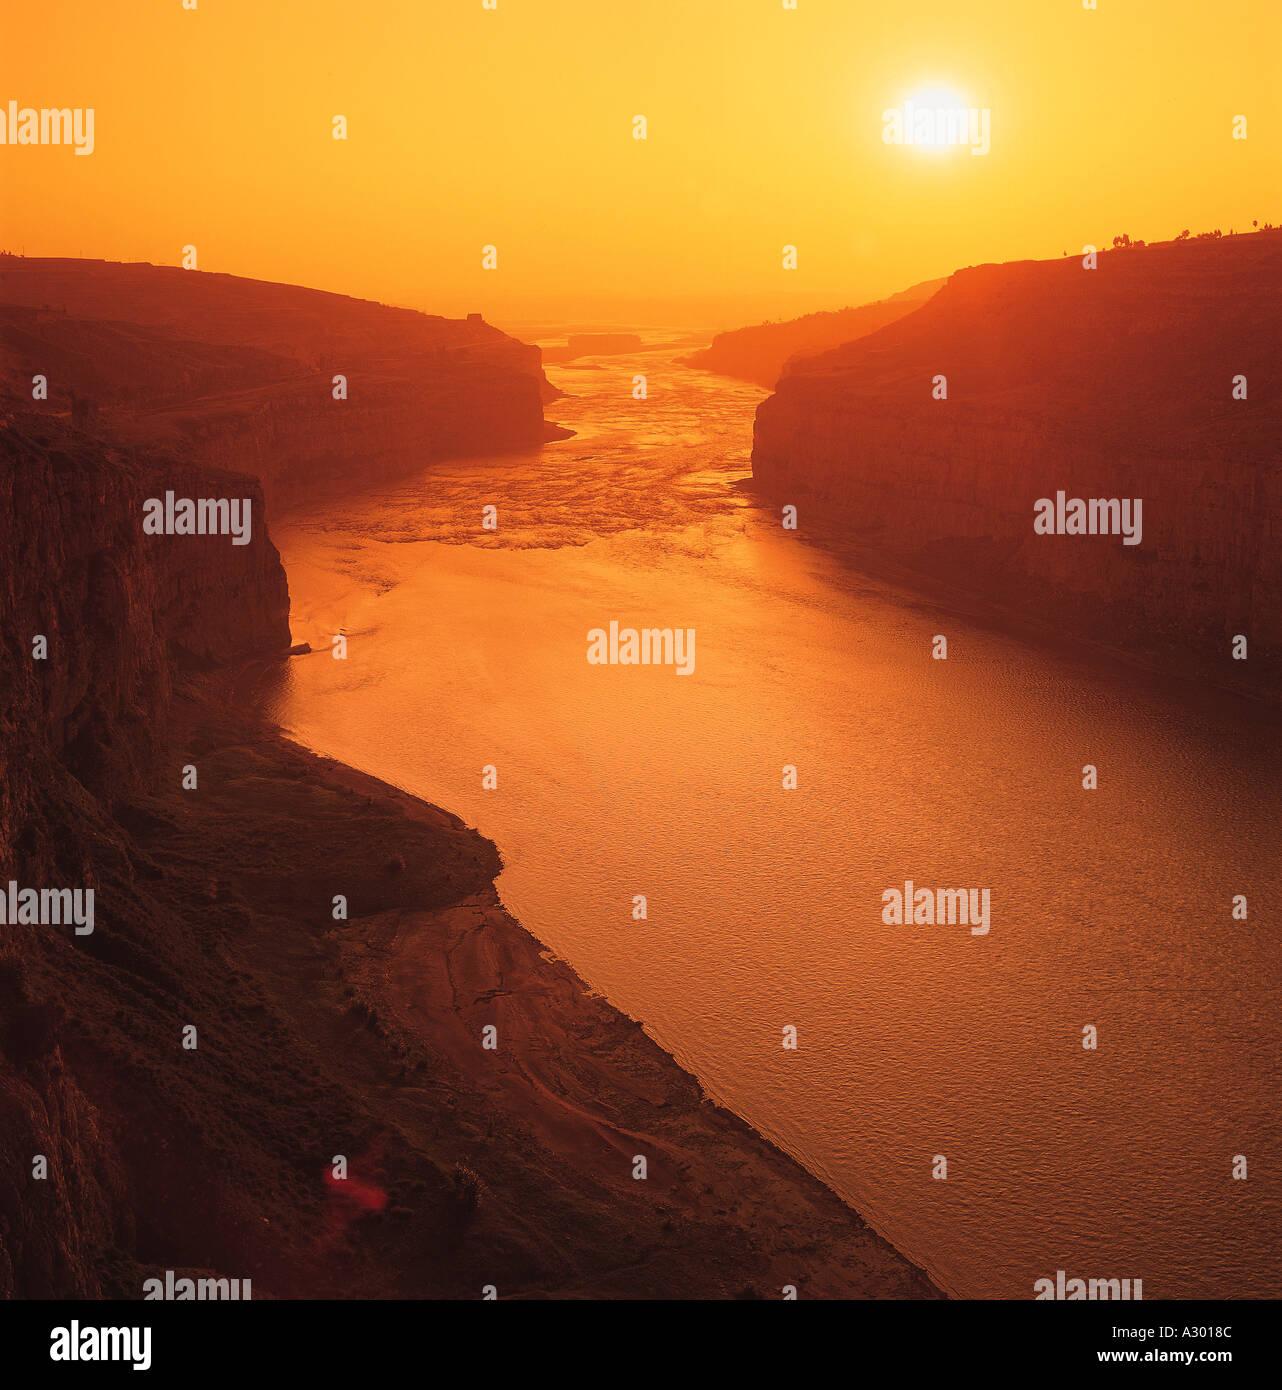 Yangtze River China - Stock Image